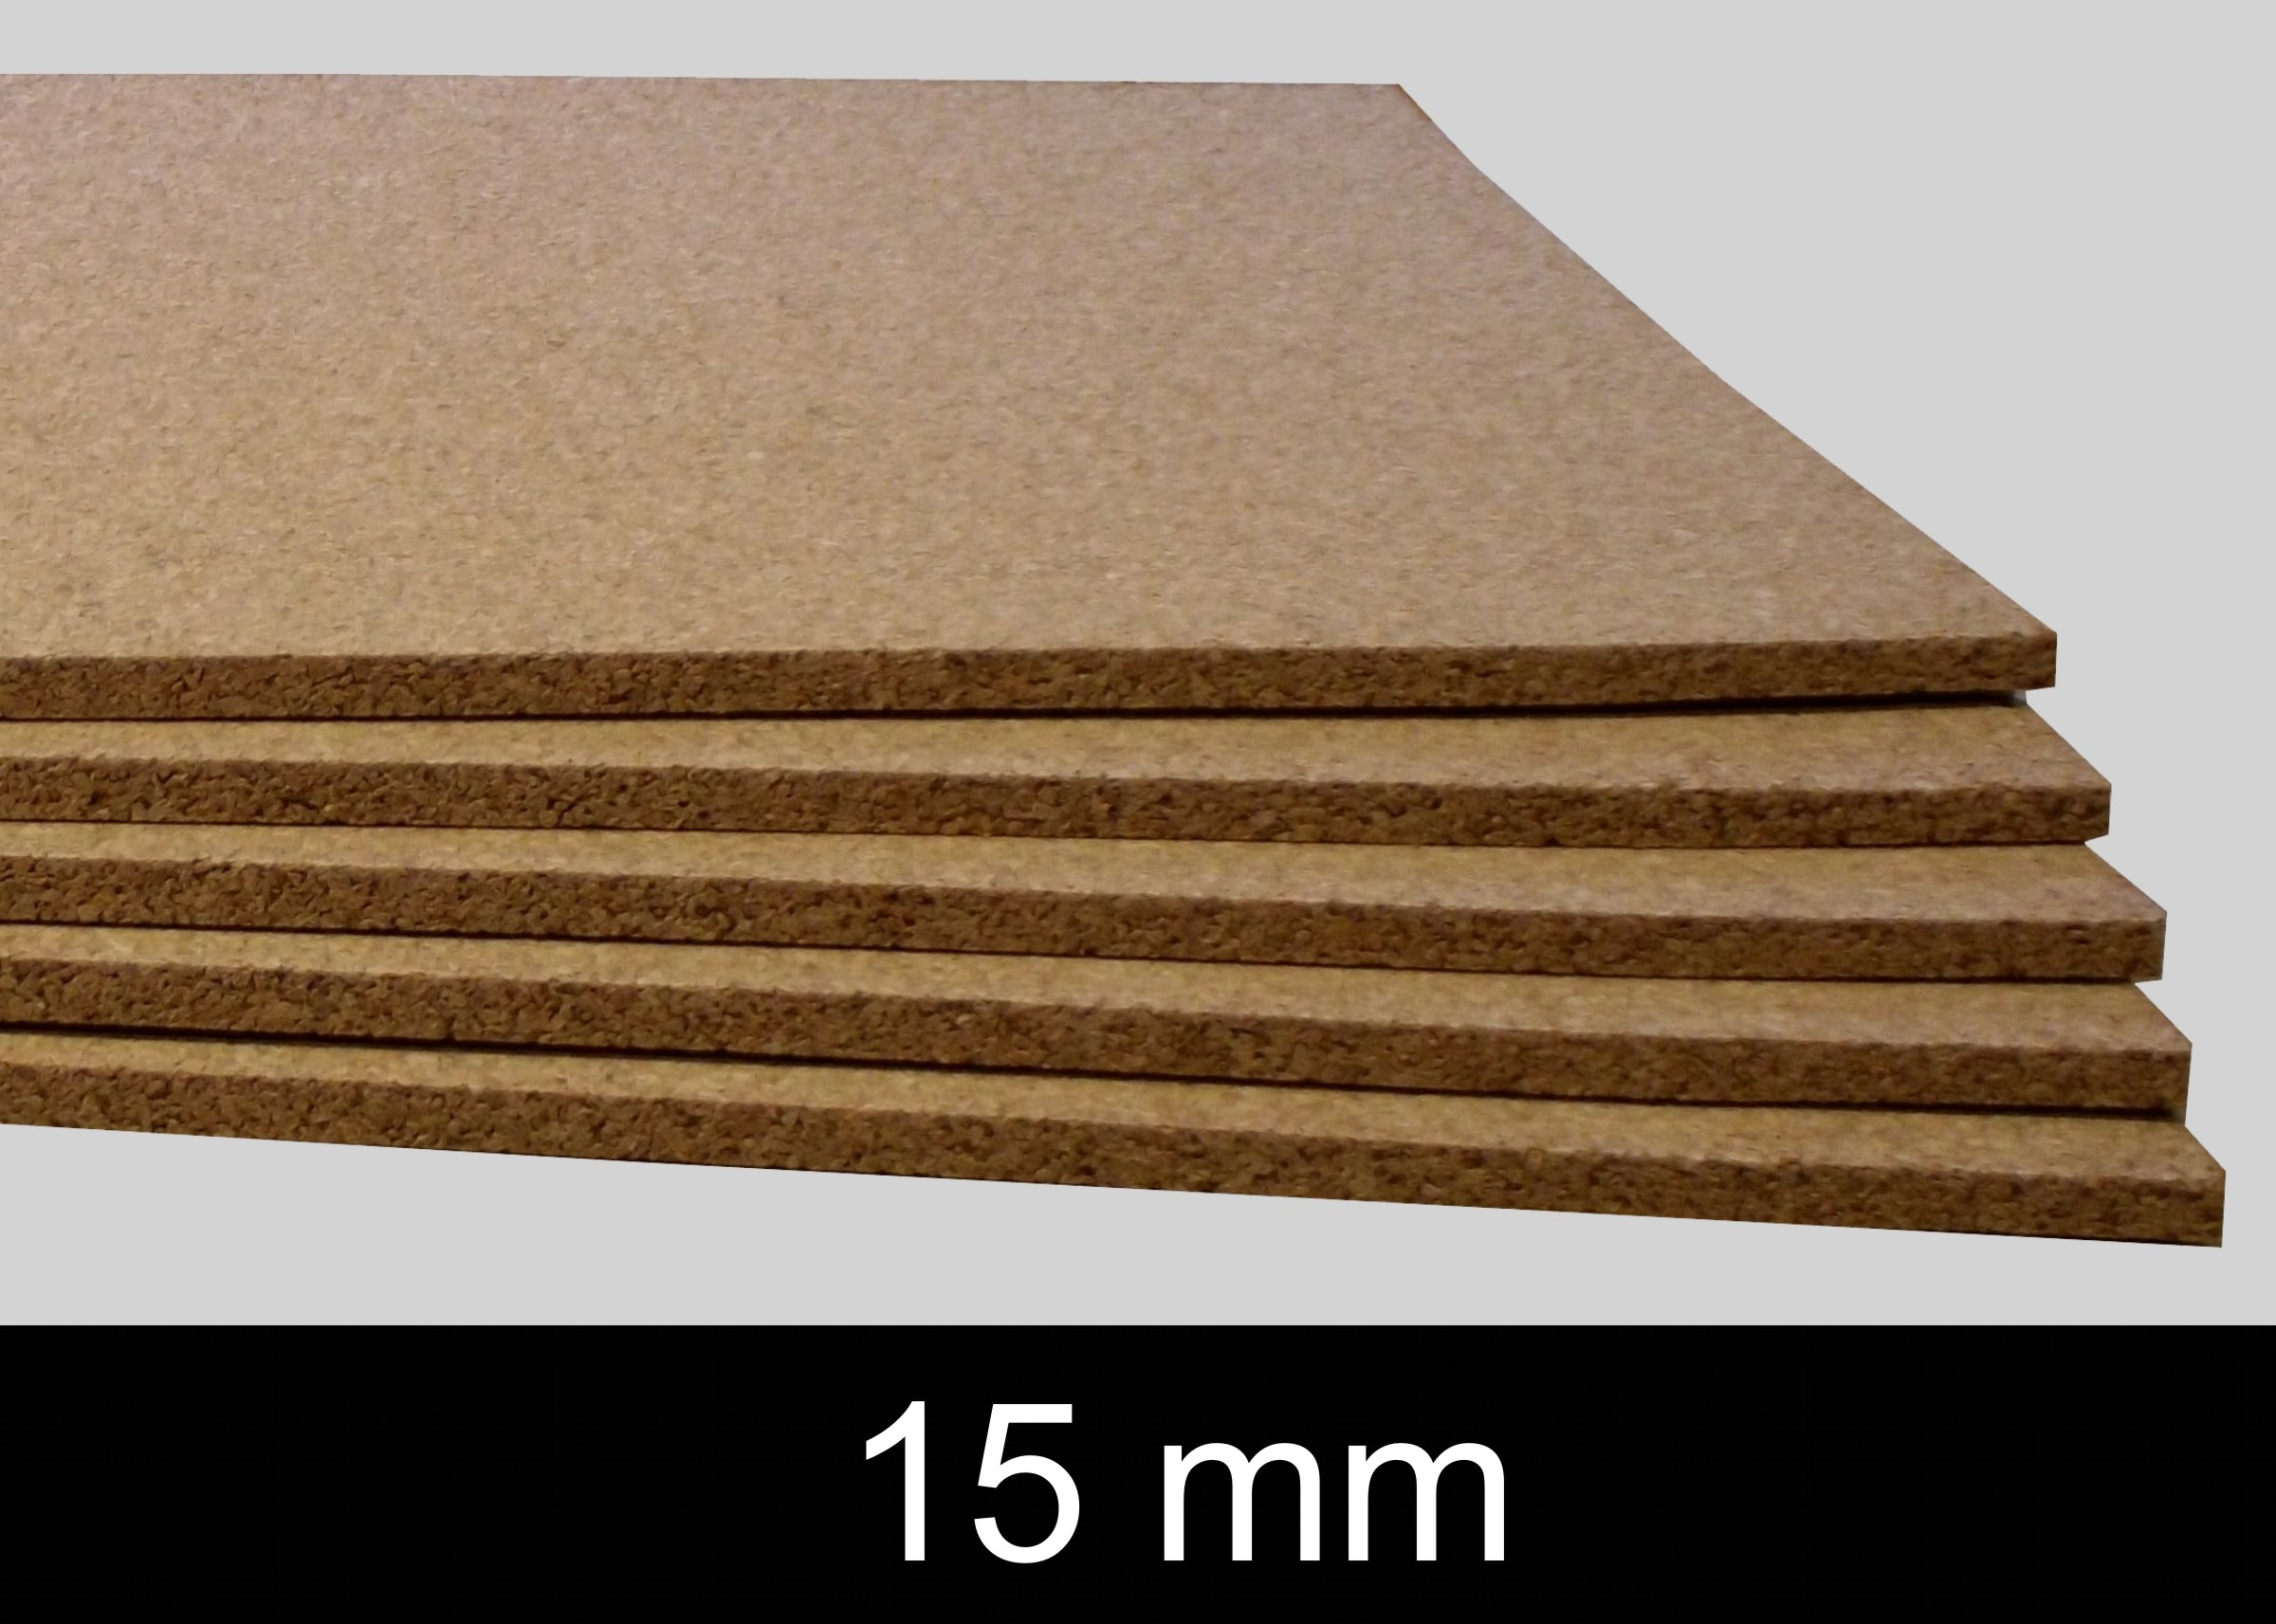 pinnwand korkplatten 2 20 mm stark xxl format 100 x 50 cm ebay. Black Bedroom Furniture Sets. Home Design Ideas